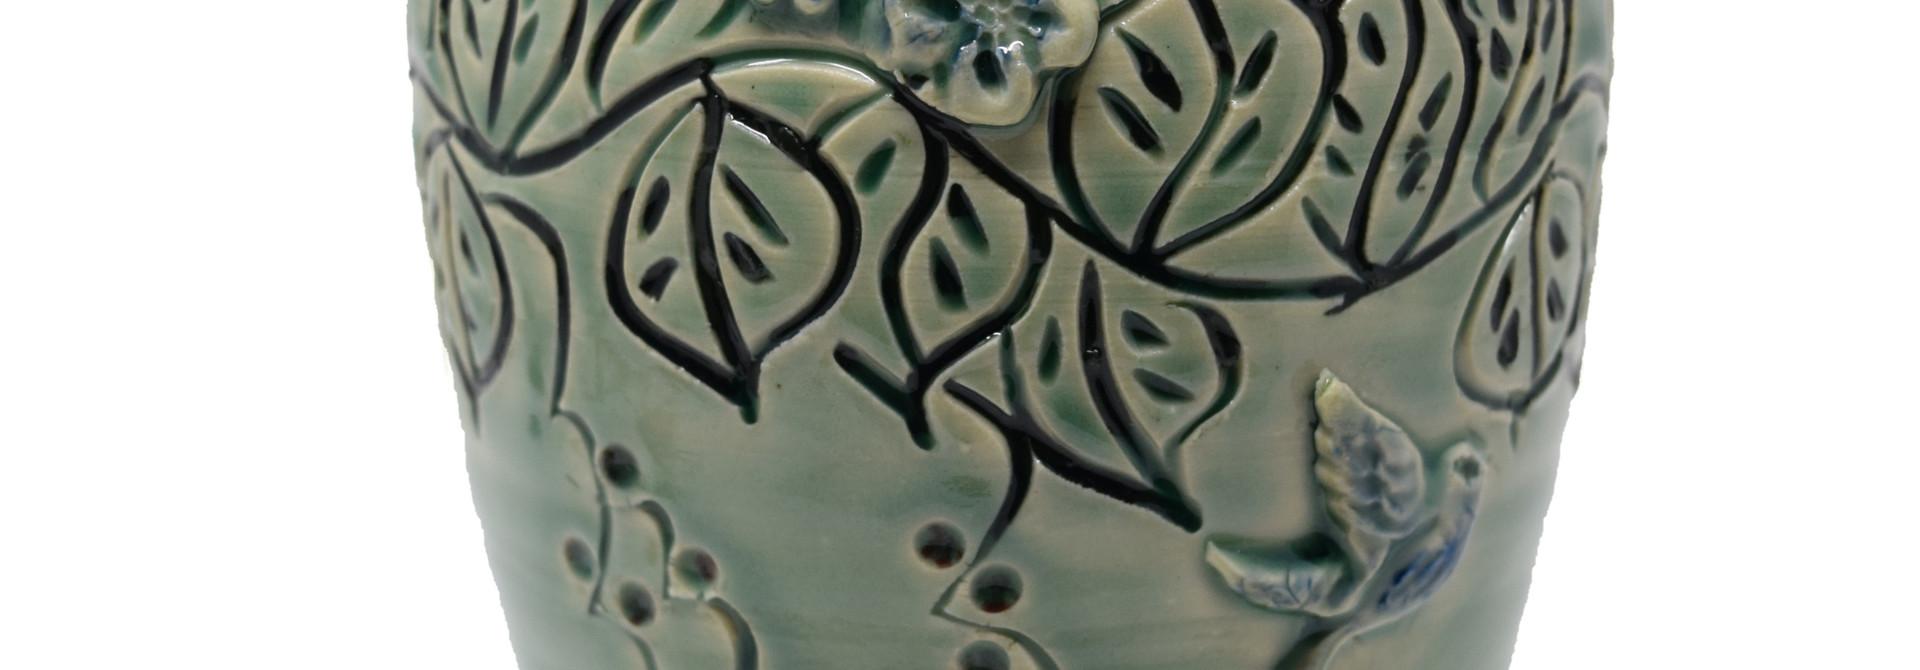 Medium Leaf Vase with Sprigs